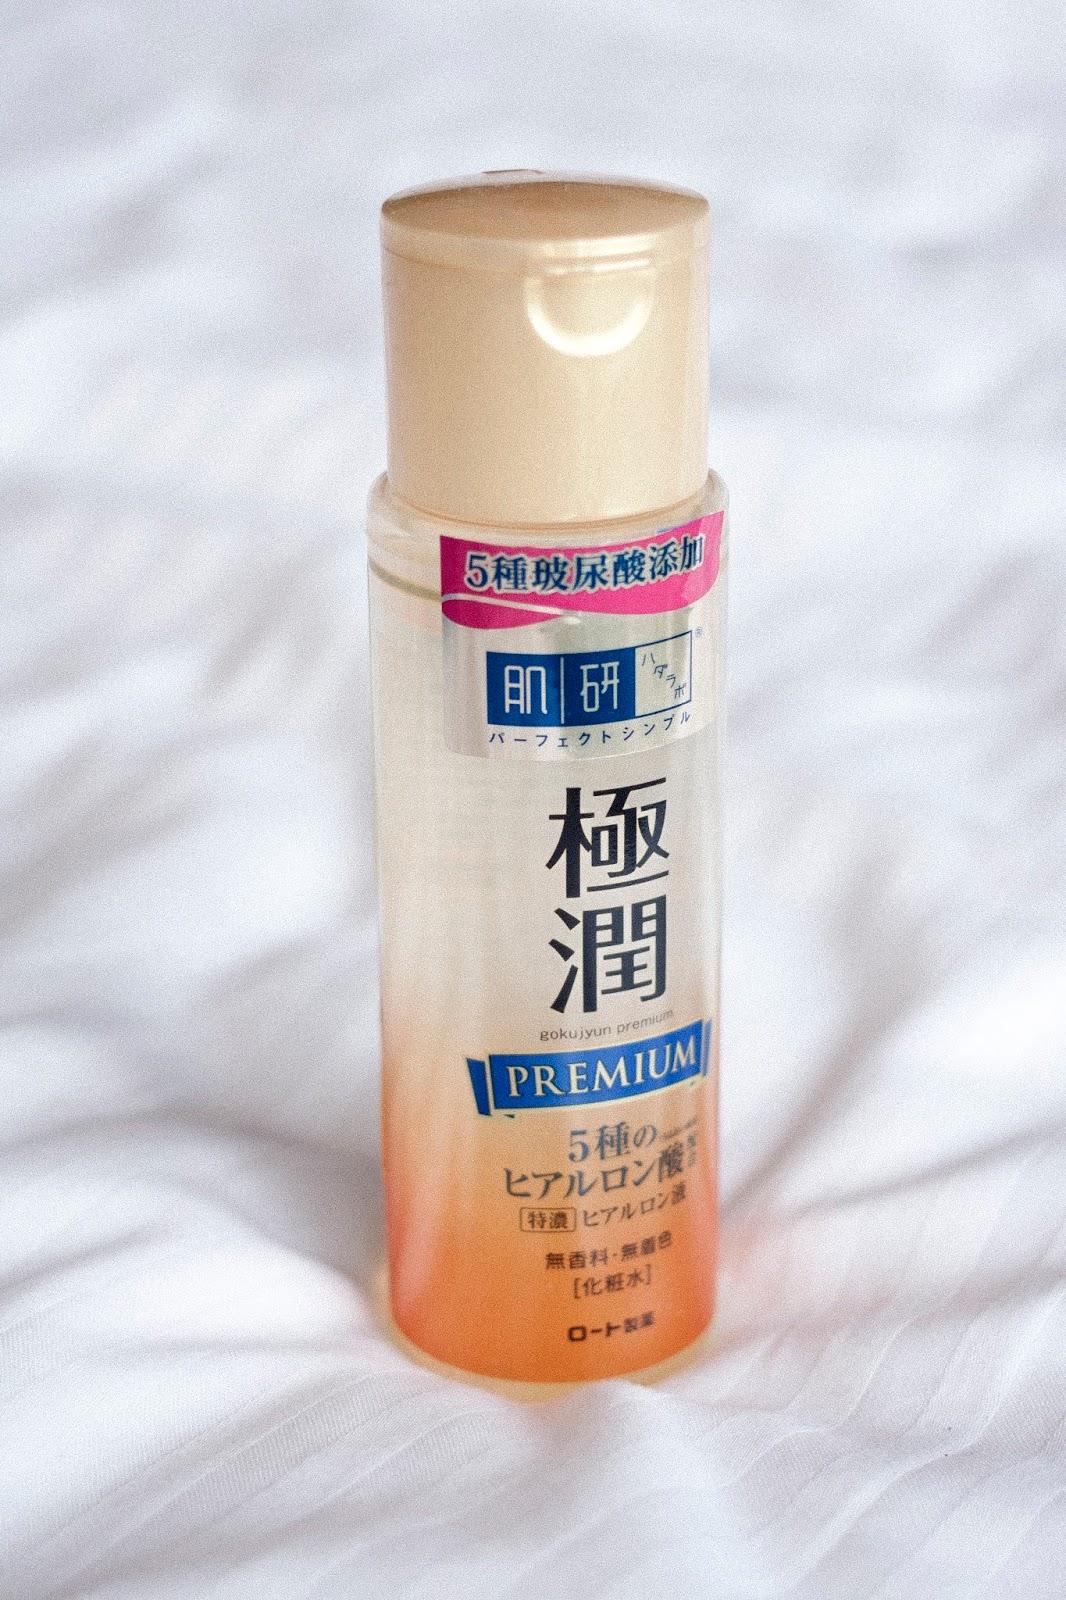 Hada Labo Gokujyun Premium Lotion Bottle